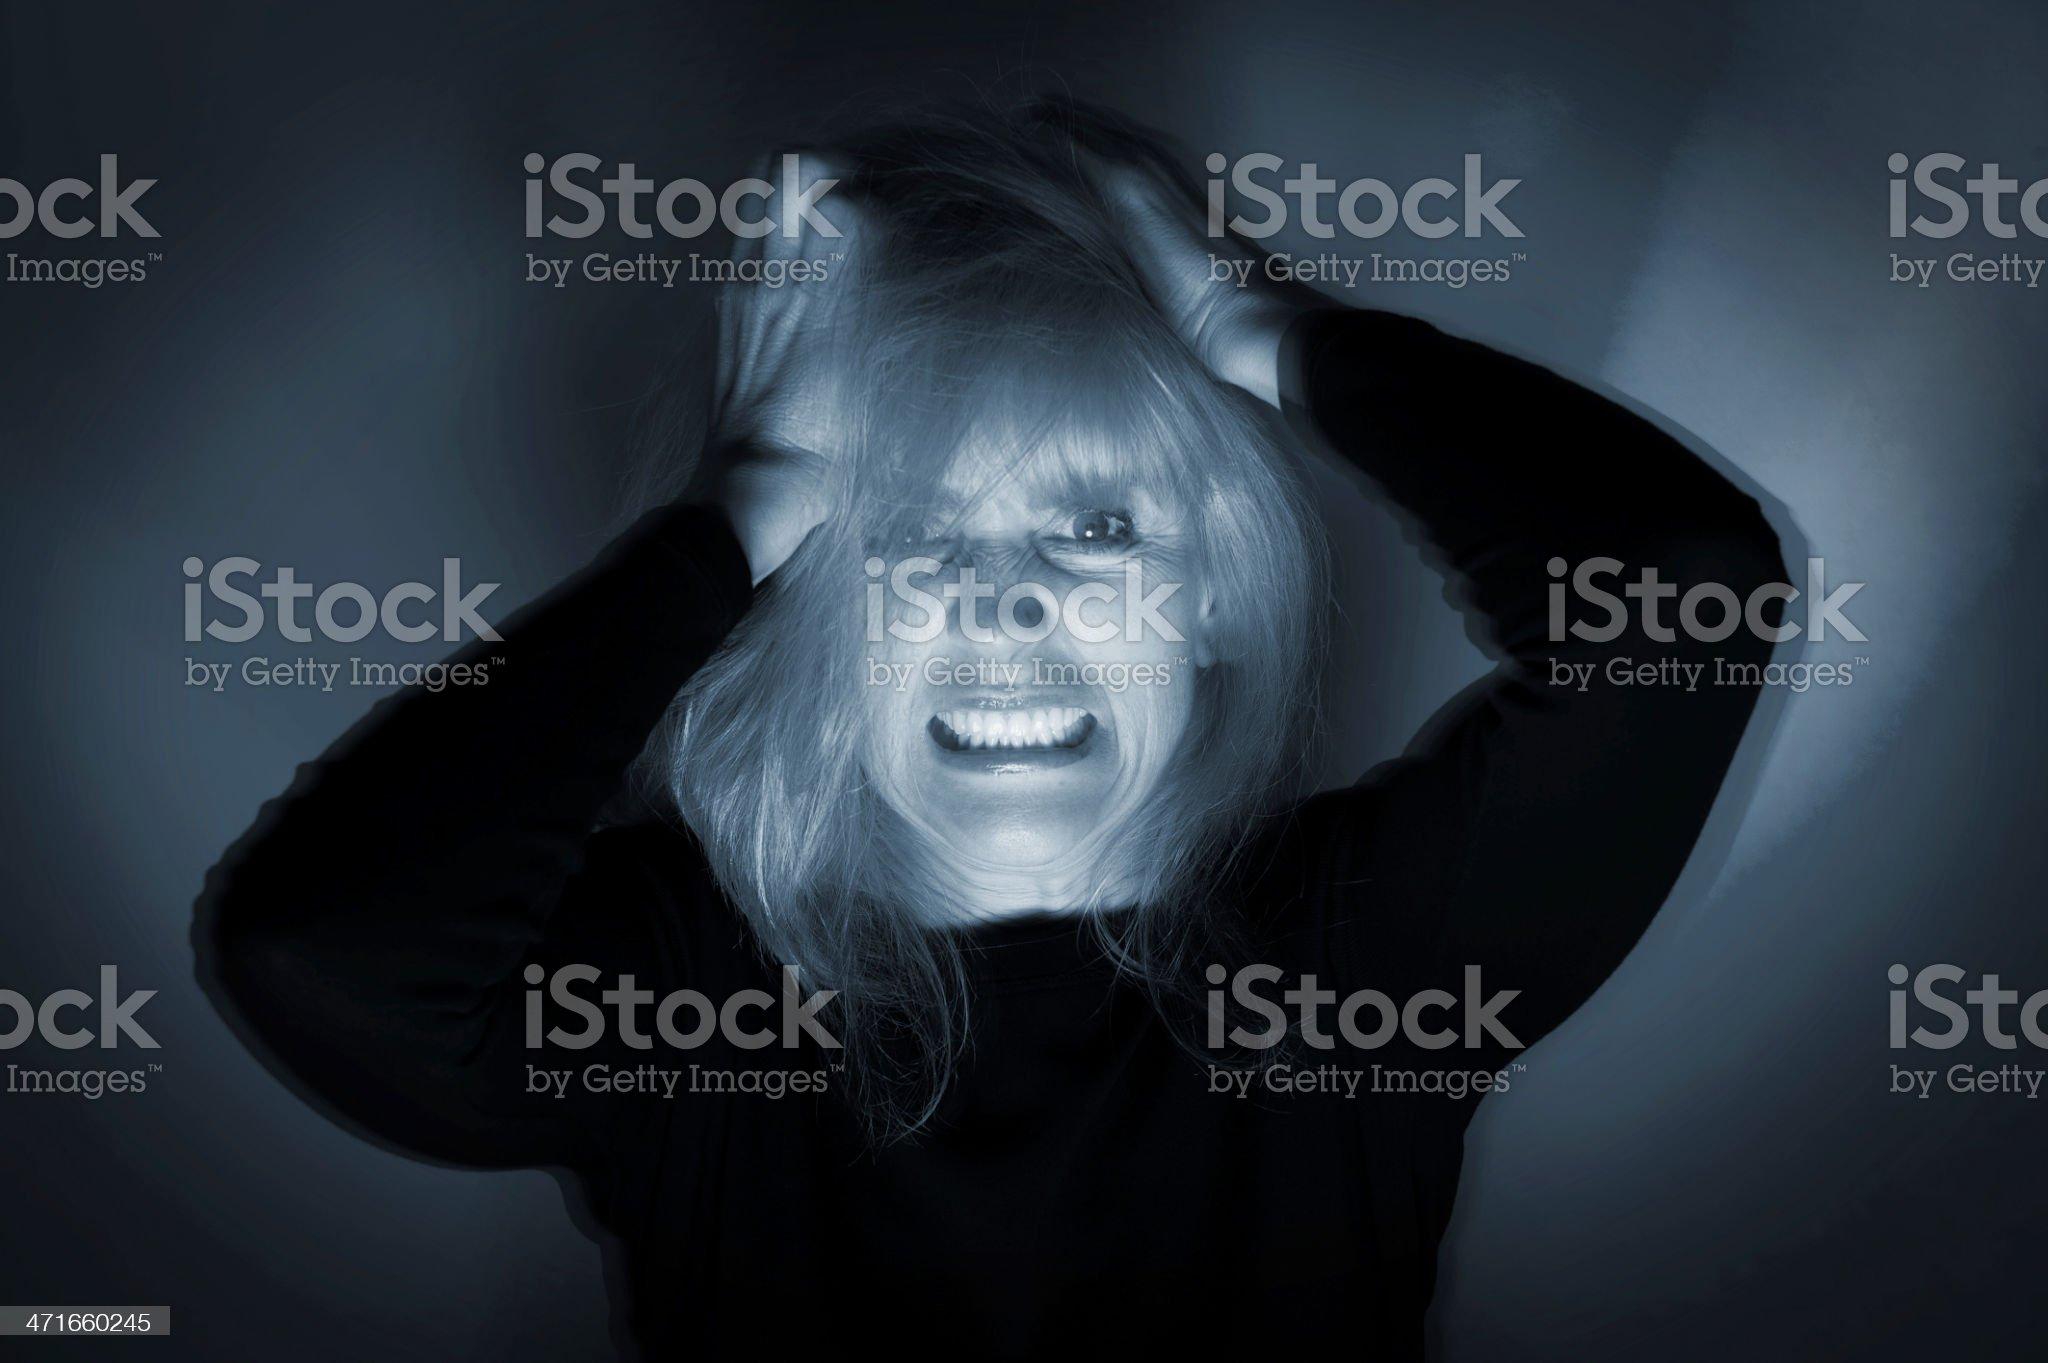 Deranged Mentally Ill Woman royalty-free stock photo